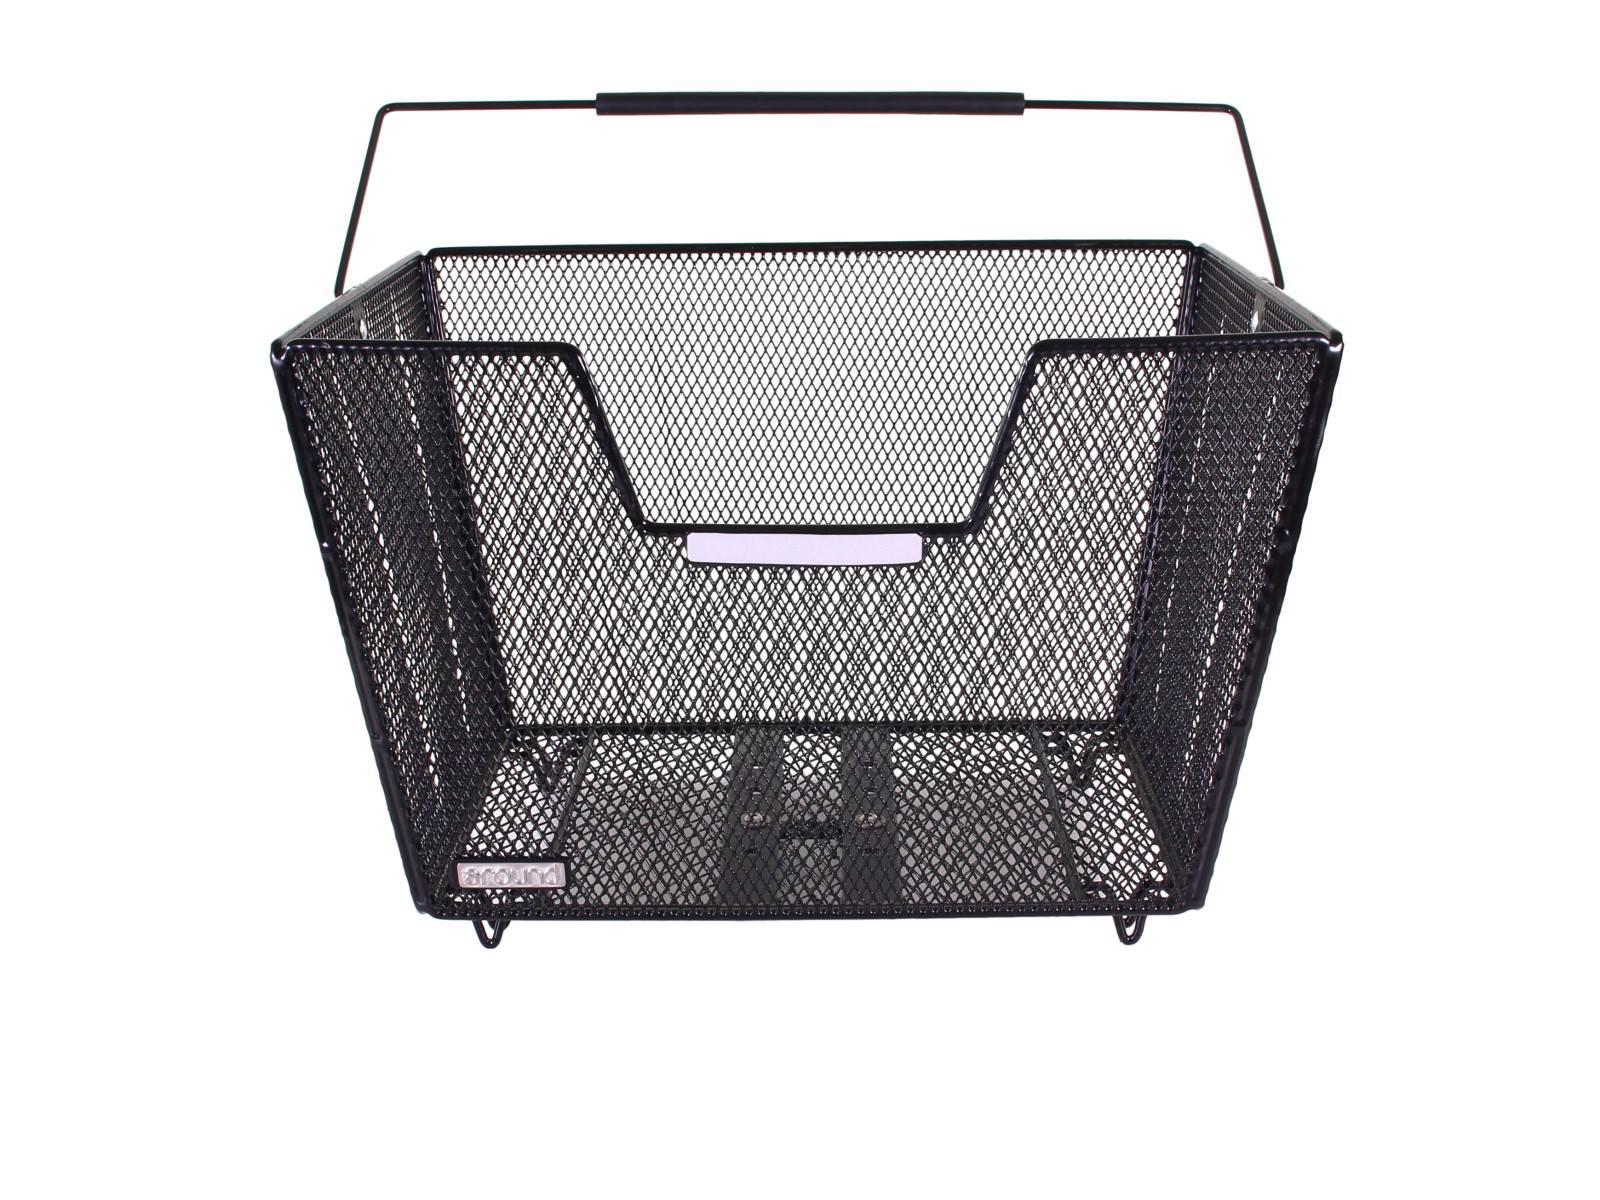 around fahrradkorb hinten fine xl high comfort. Black Bedroom Furniture Sets. Home Design Ideas